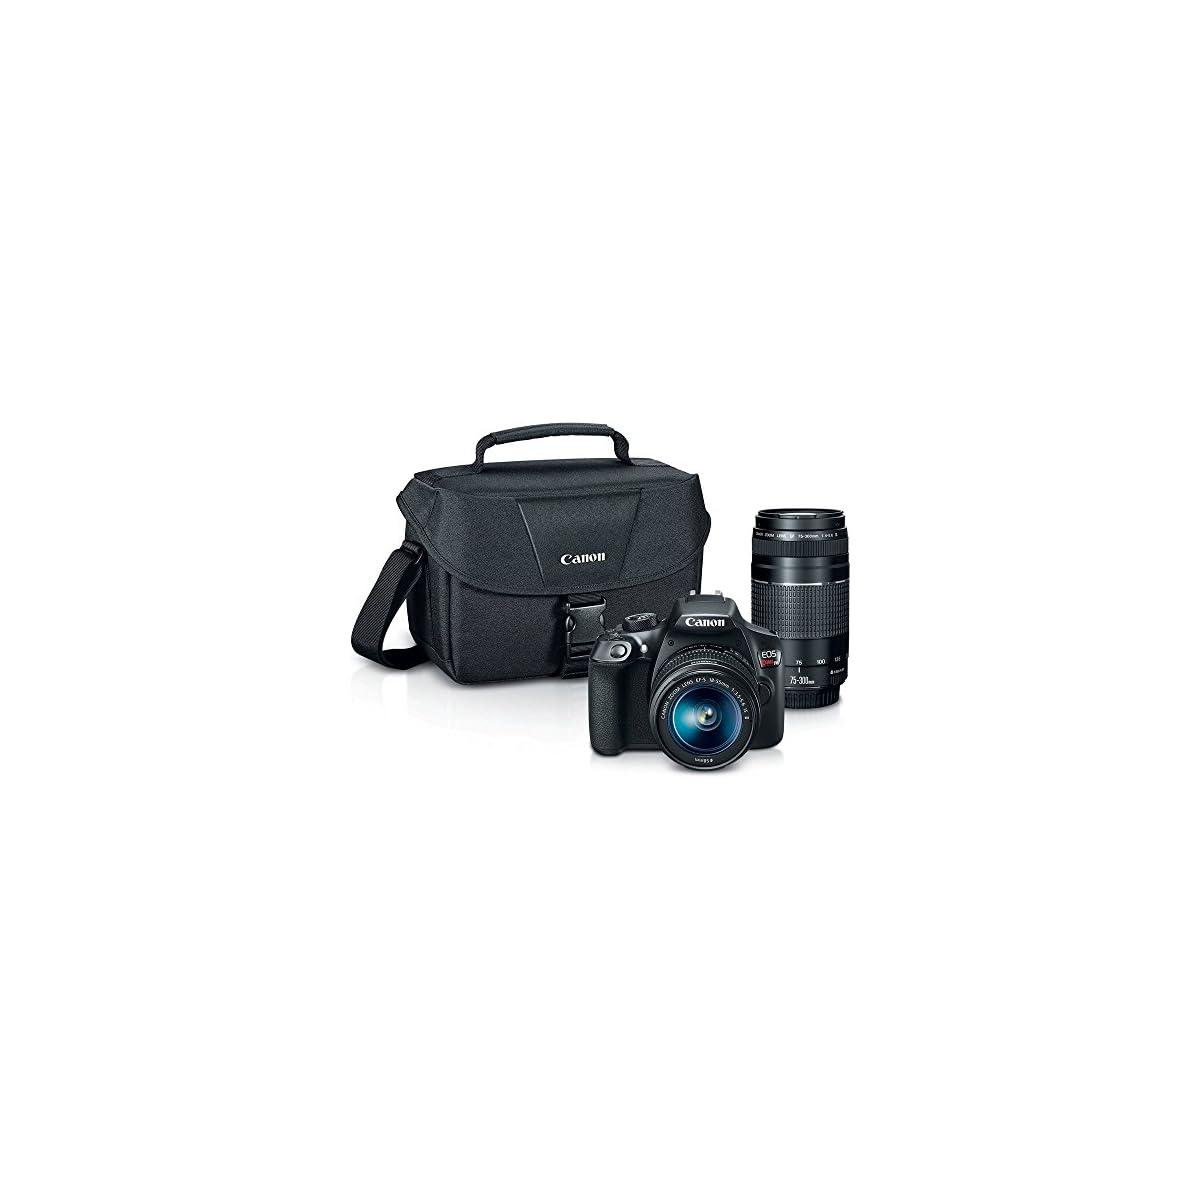 SaleProductsOffer - No.1 Best Online Store 51MxzH0J3WL Canon Digital SLR Camera Kit [EOS Rebel T6] with EF-S 18-55mm and EF 75-300mm Zoom Lenses - Black